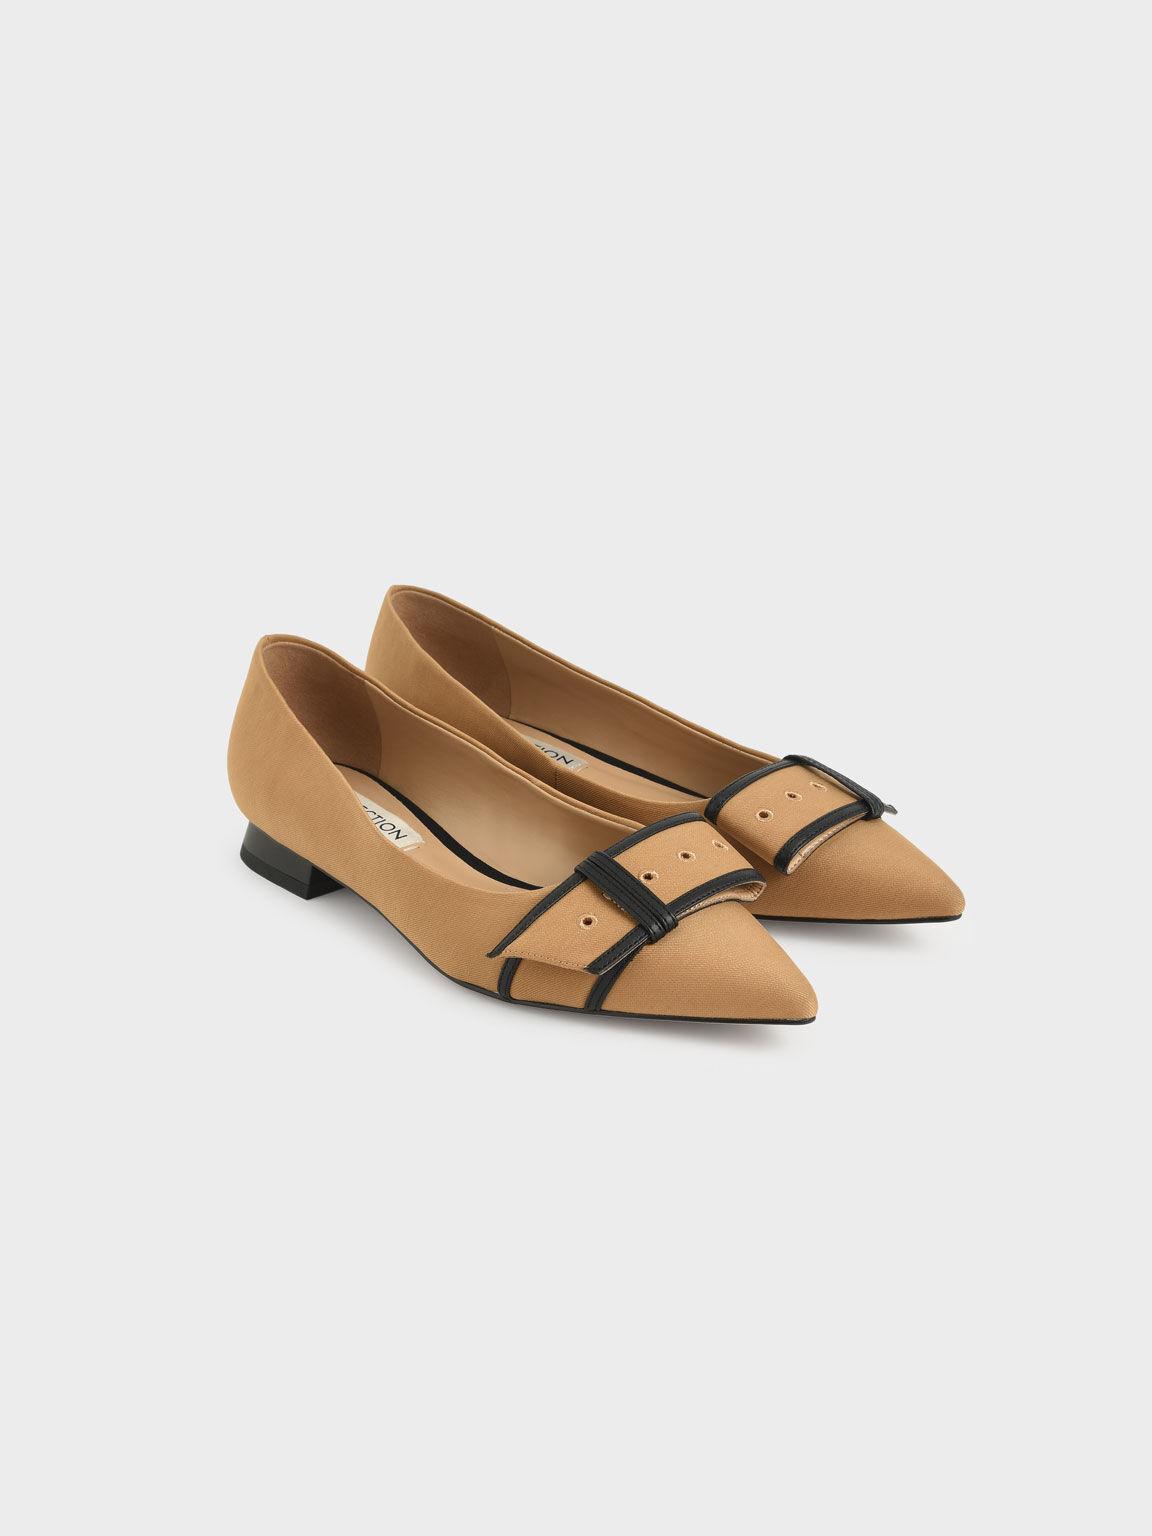 Twill Eyelet-Embellished Ballerina Flats, Camel, hi-res